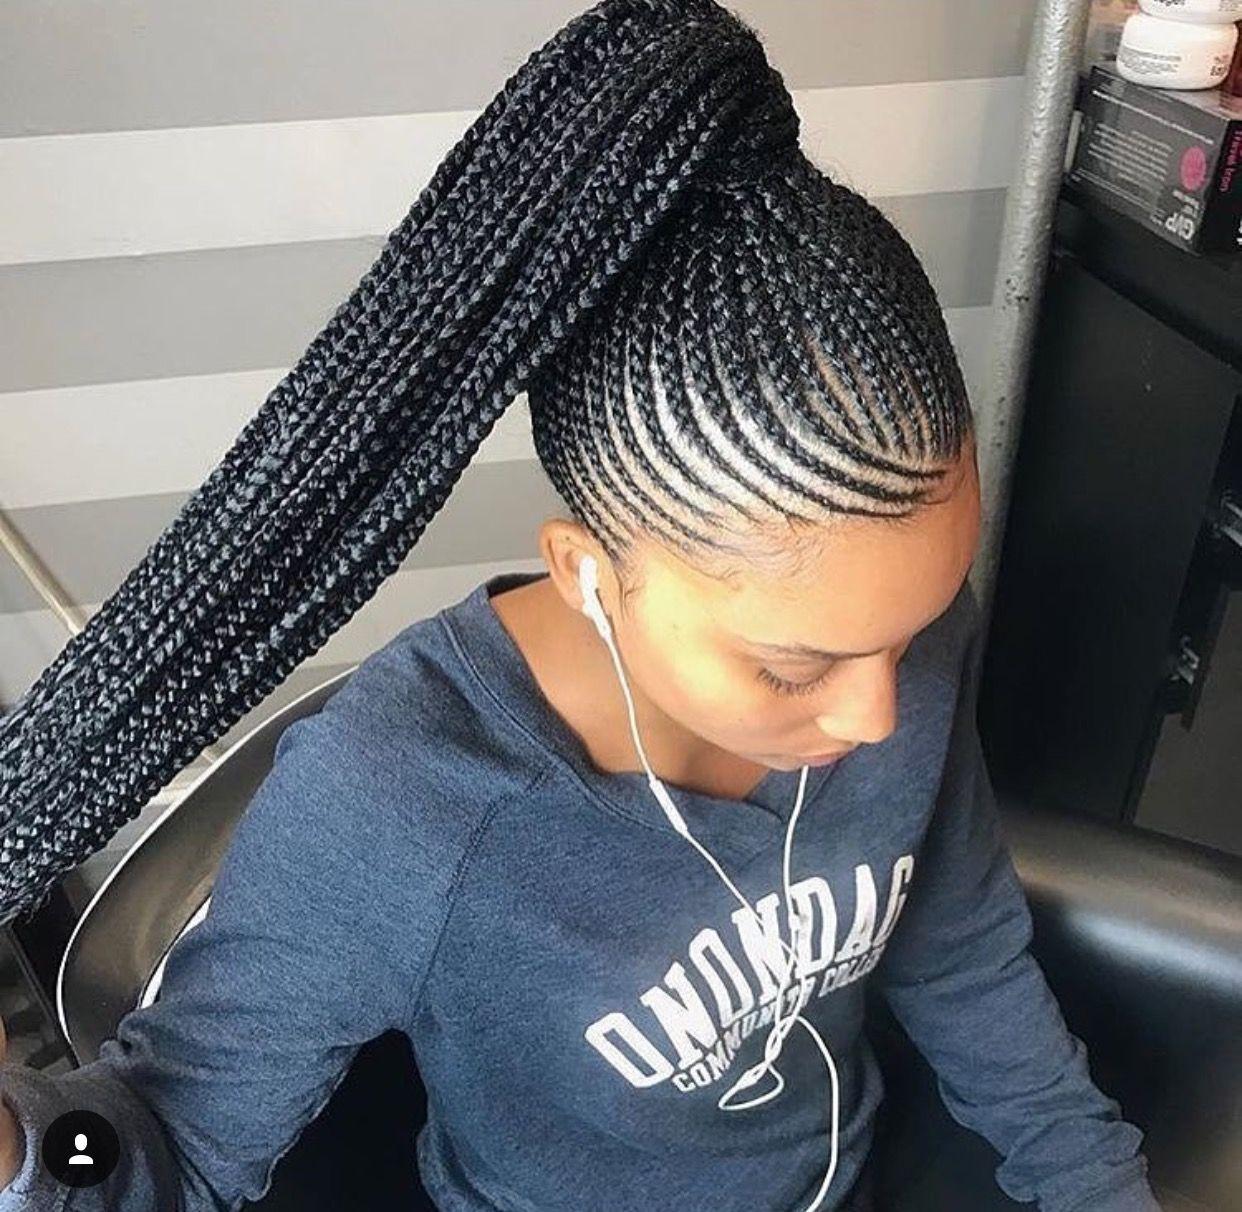 pinterest| @amea101 | braids✨ in 2019 | braided ponytail